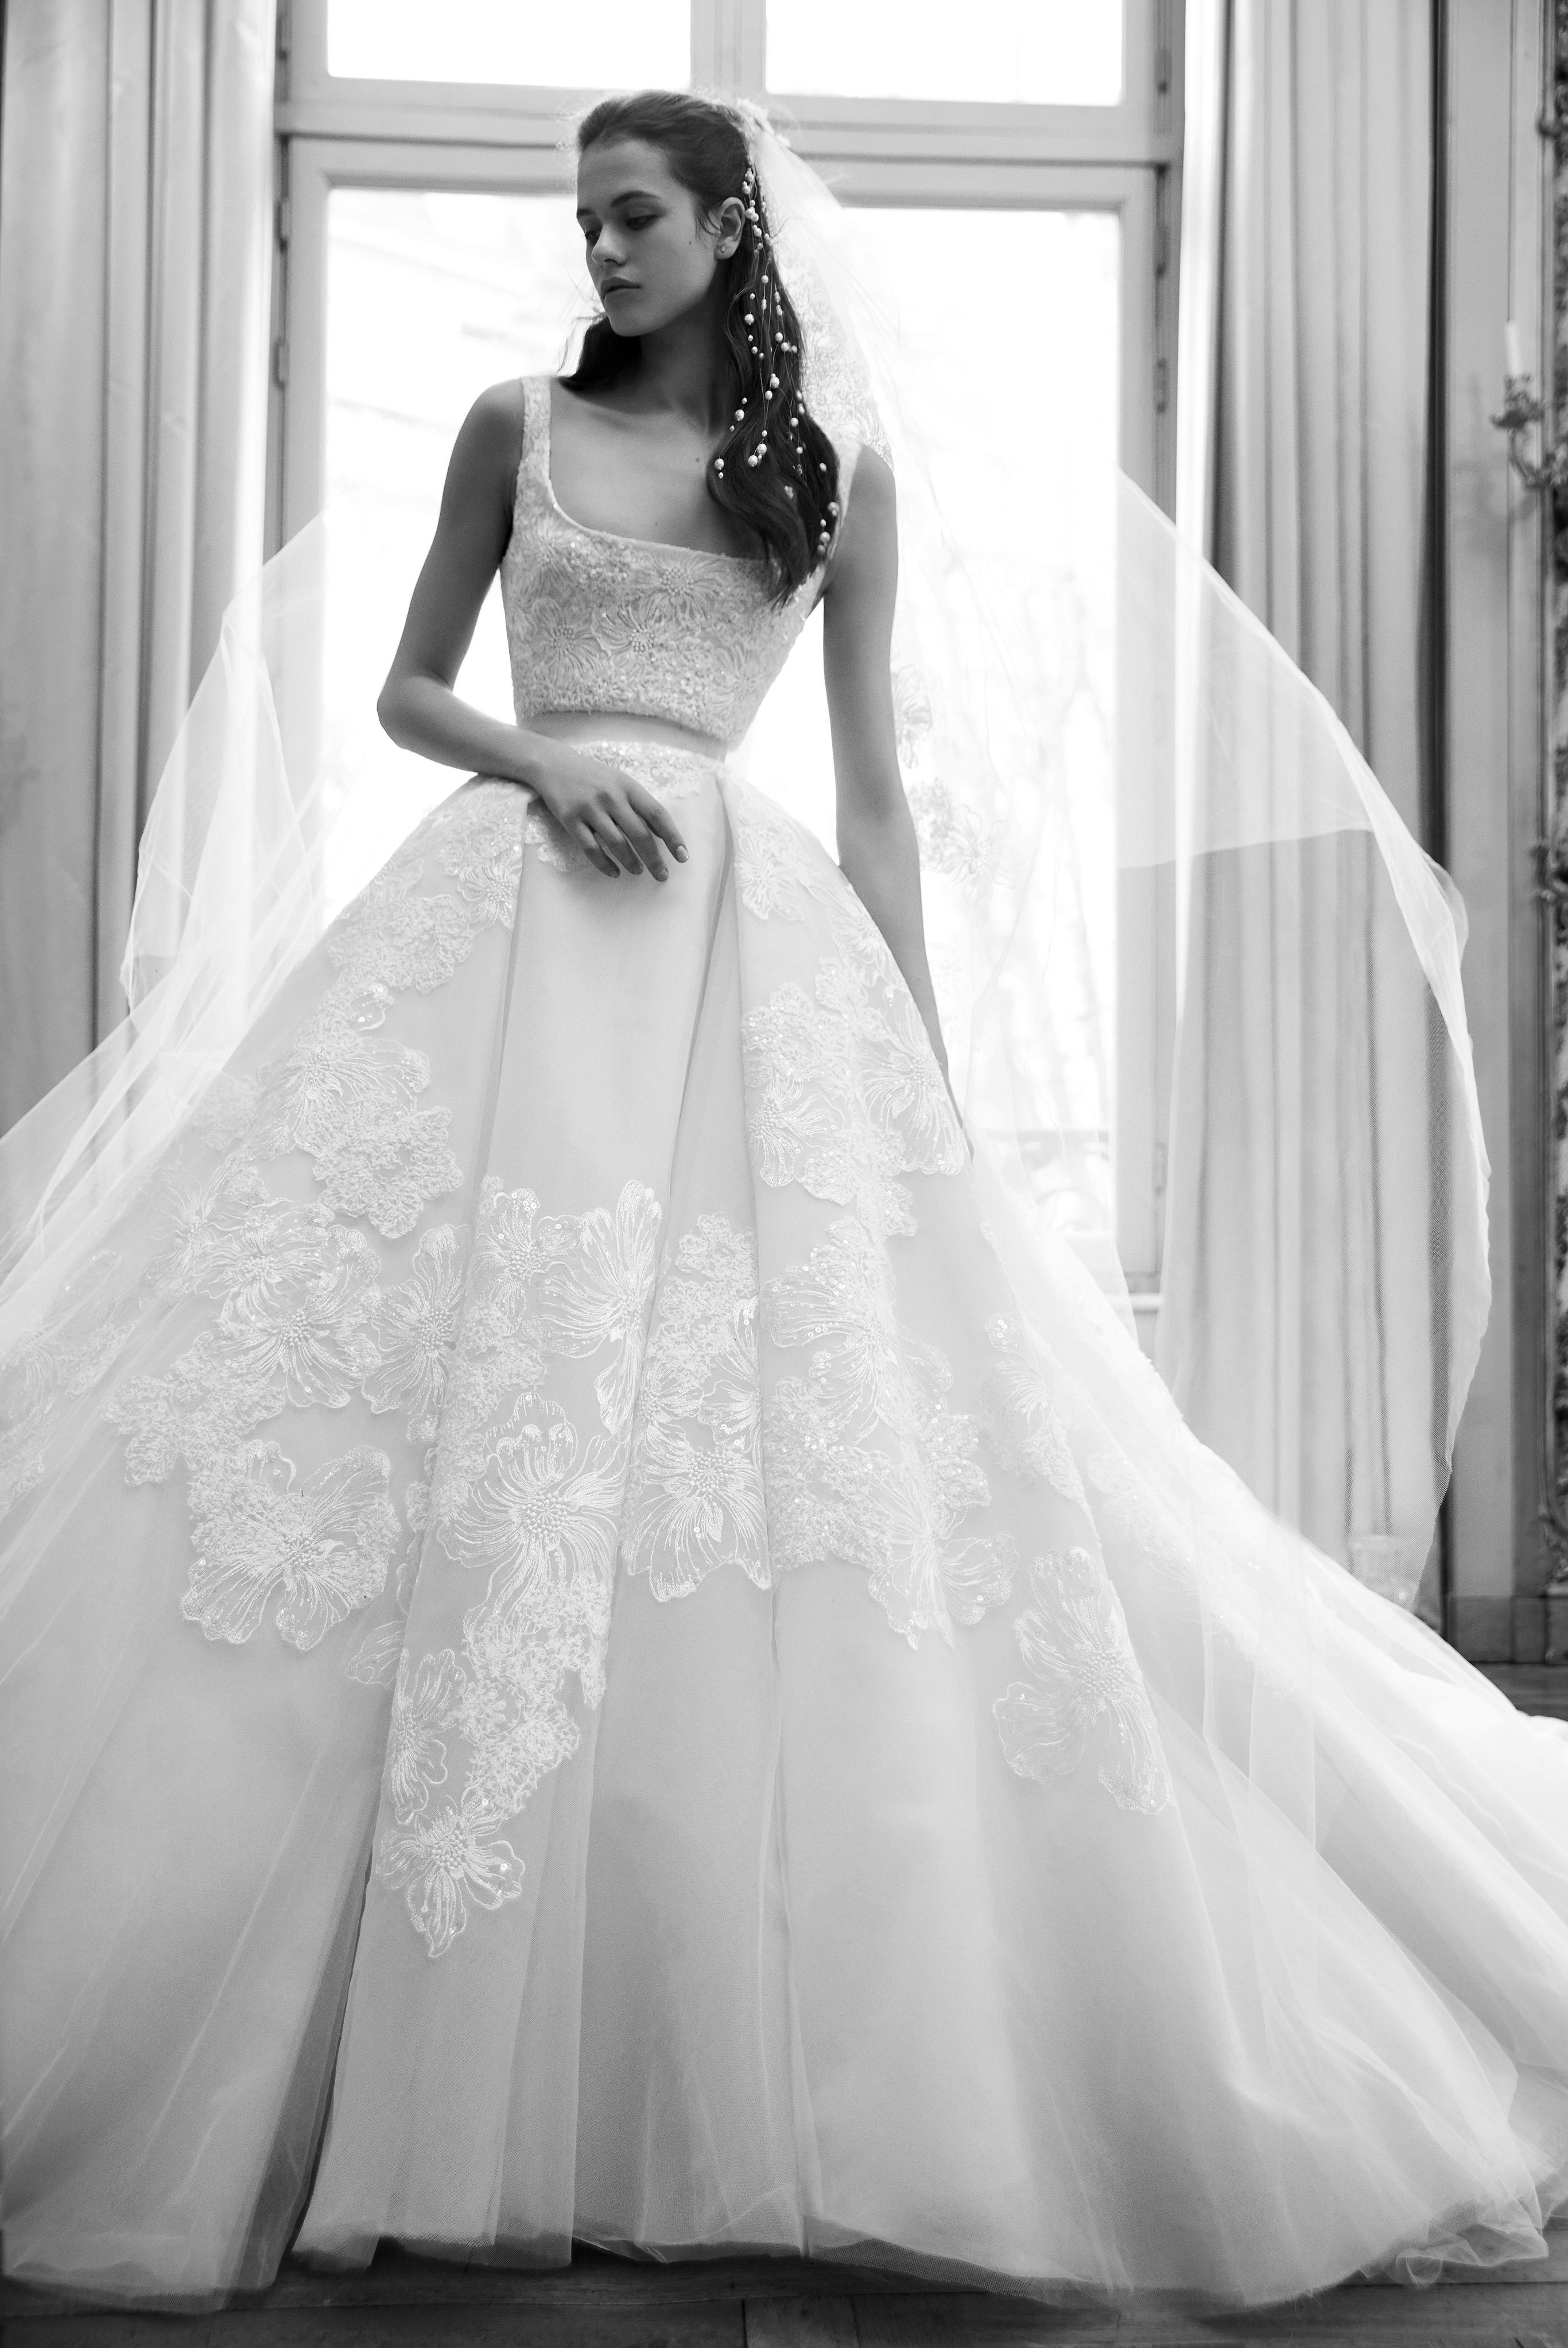 elie saab wedding dress spring 2019 floral embroidery ballgown sleeveless